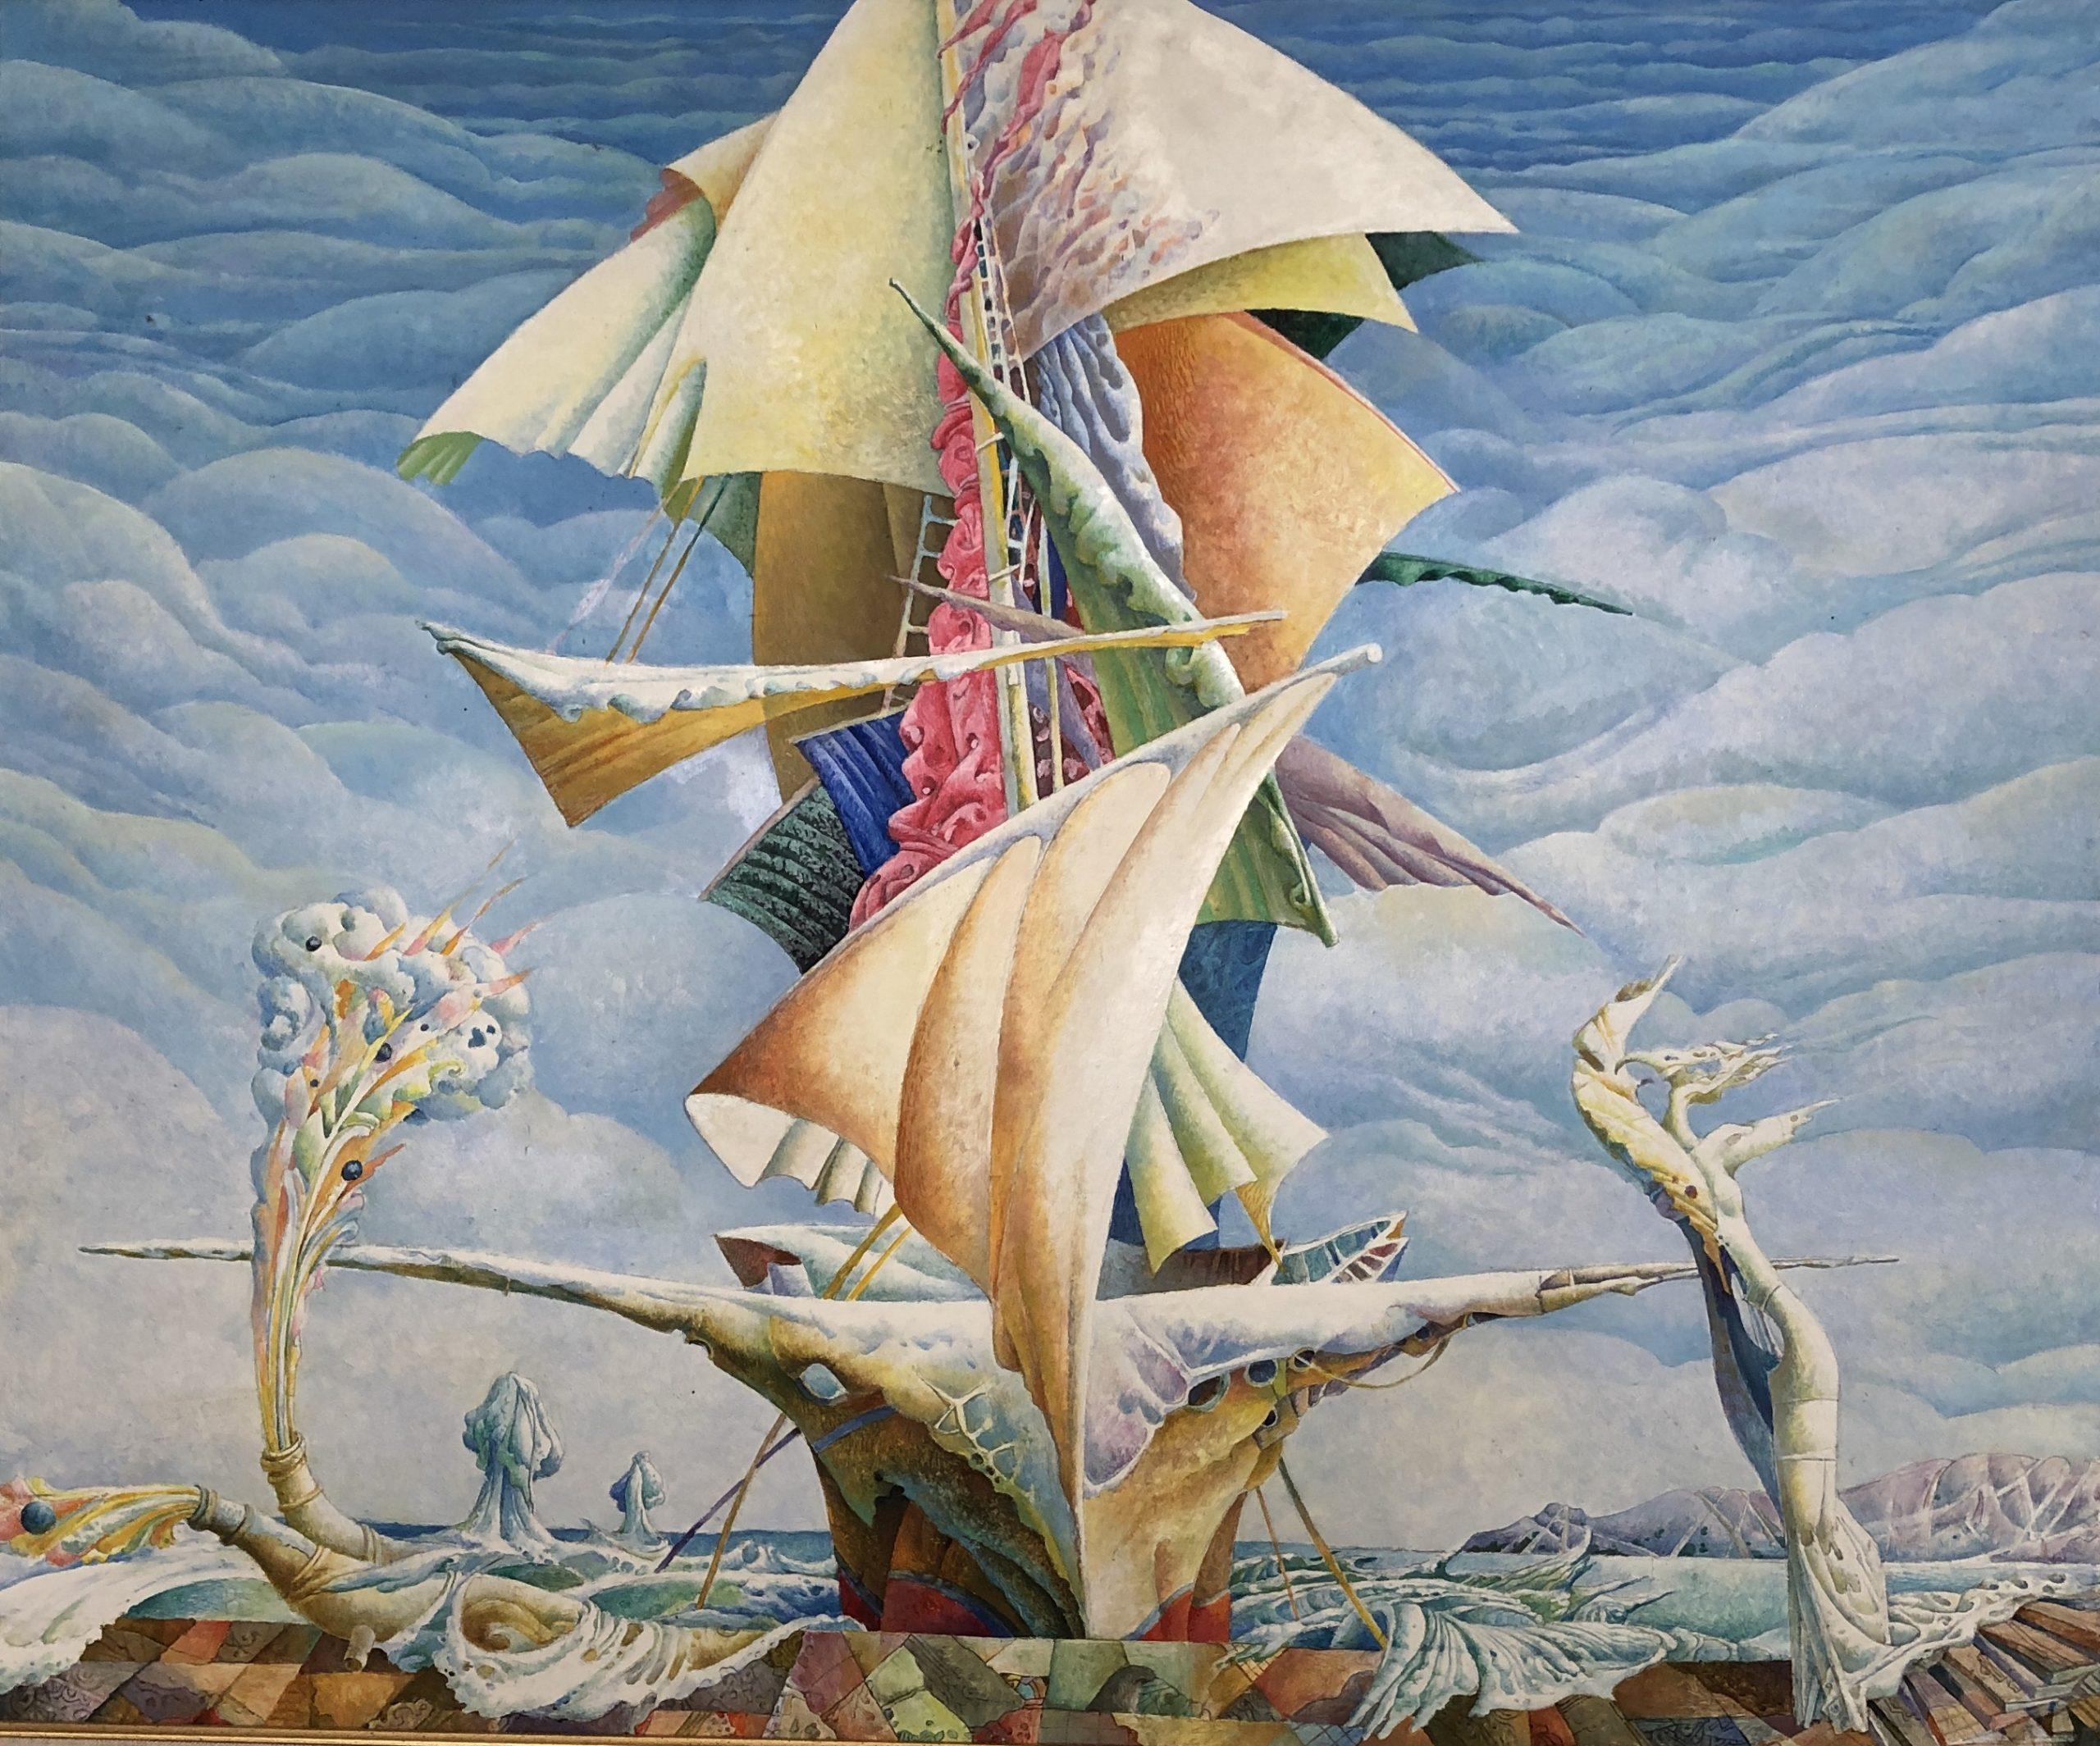 Vladimir Dikarev: Poetic Surrealism post image